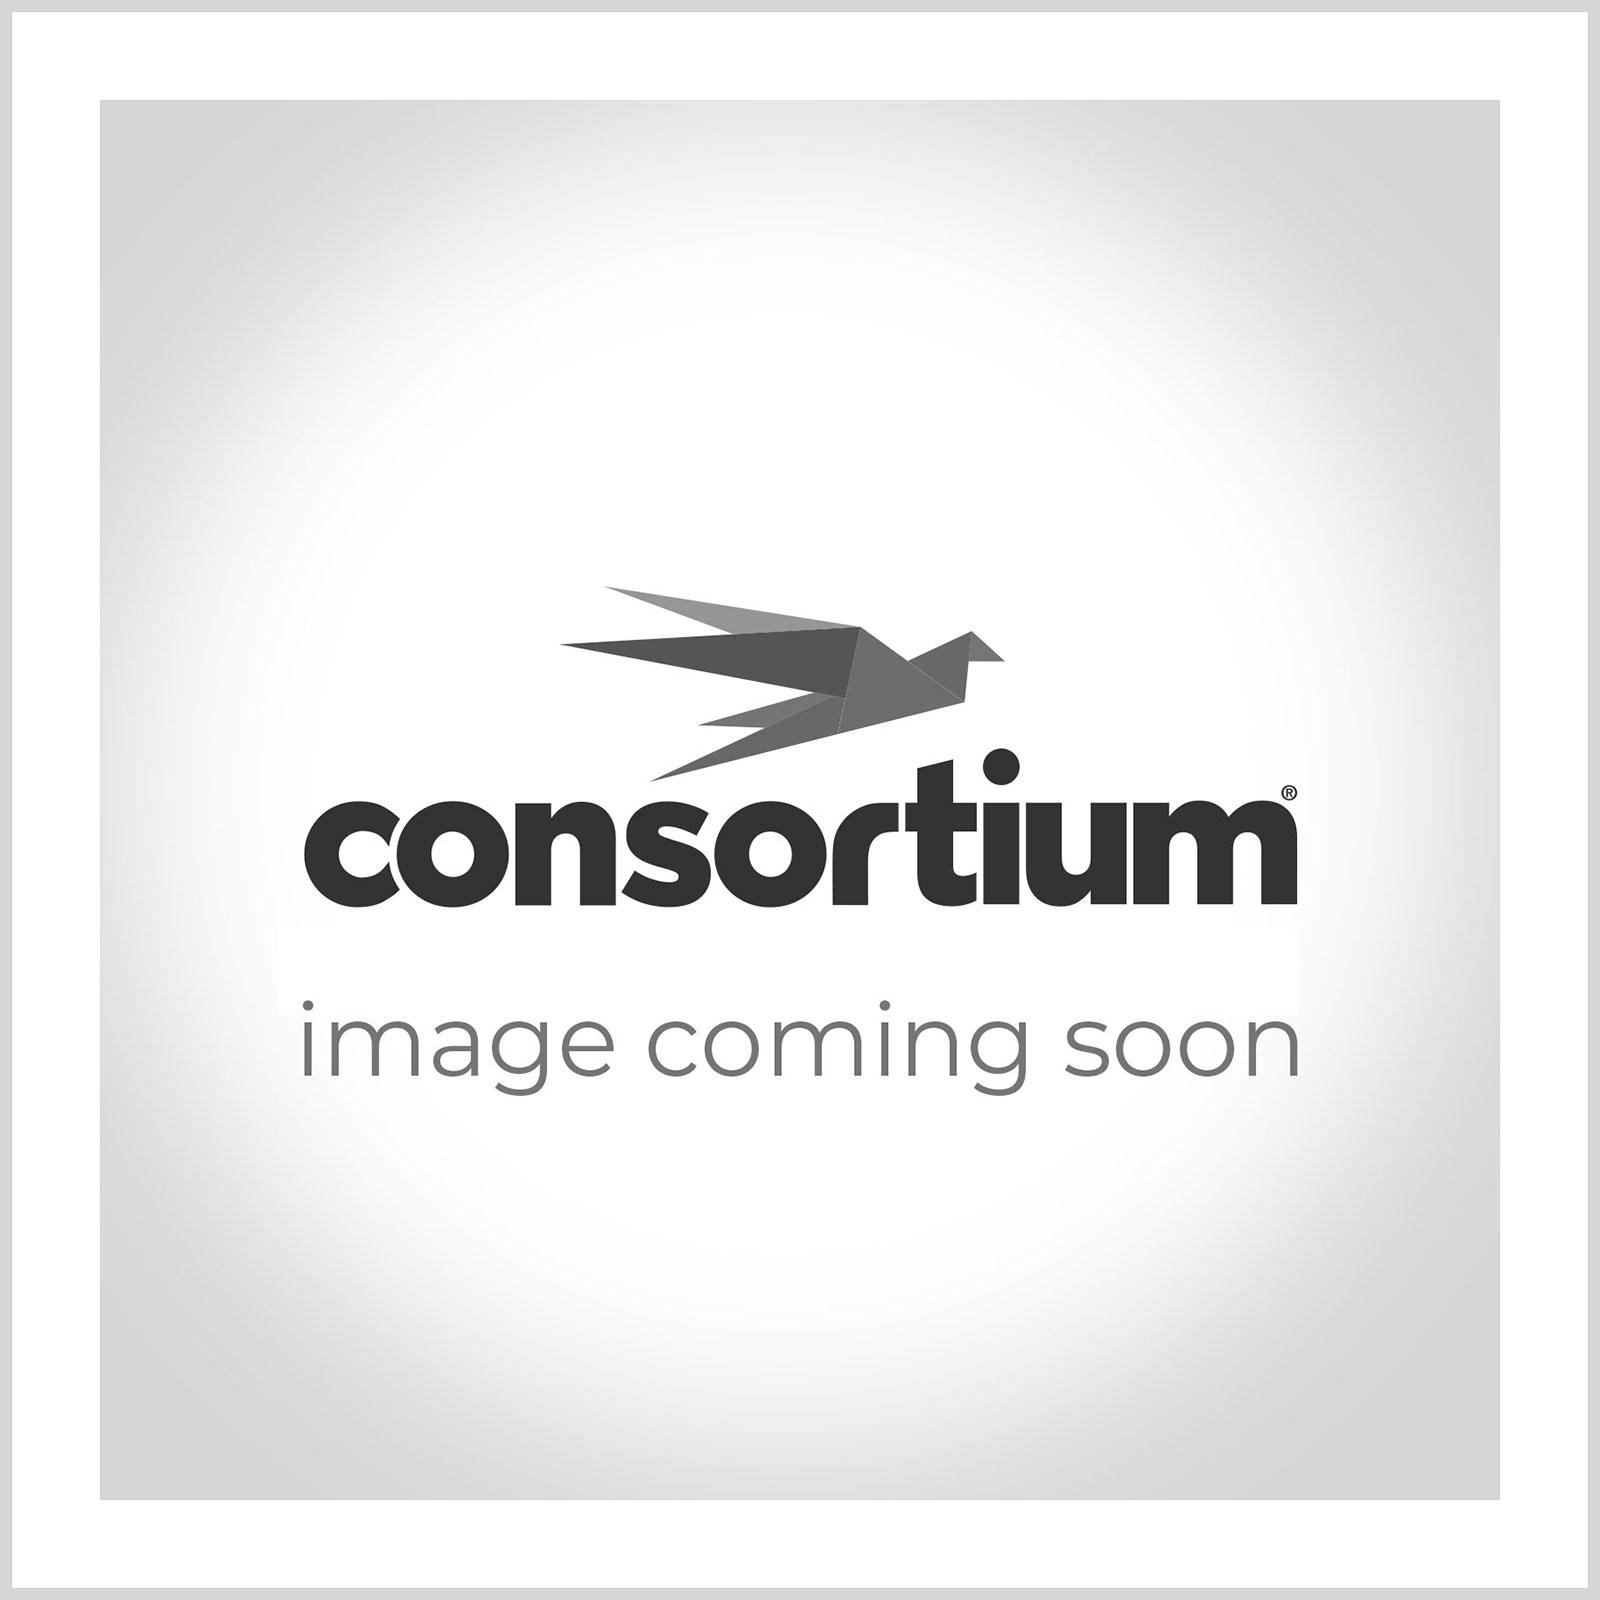 Consortium Mini Jumbo Toilet Rolls 2 Ply